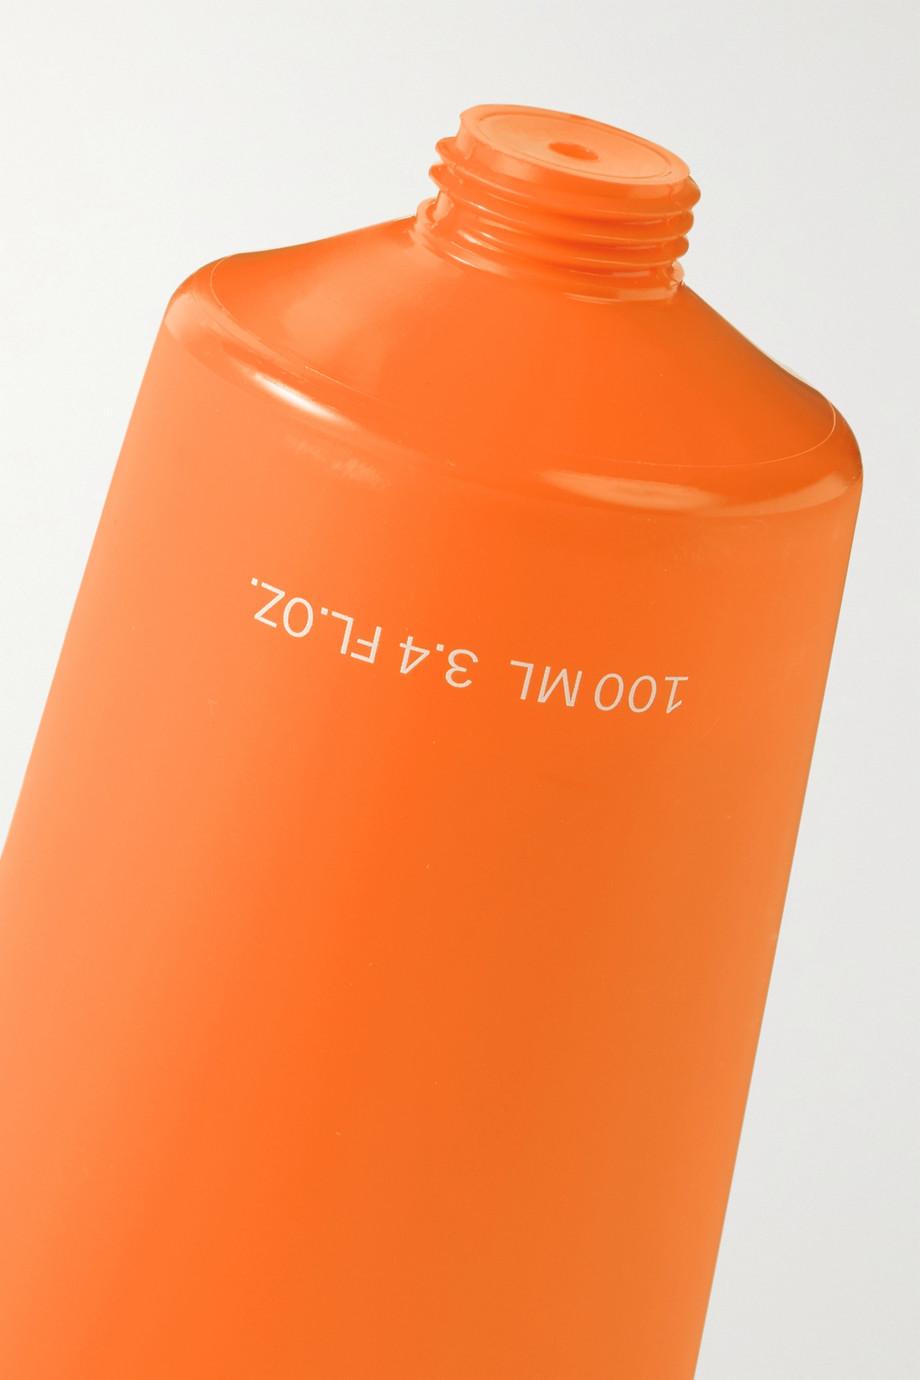 SACHAJUAN Hair In The Sun, 100 ml – Haarpflege mit UV-Schutz